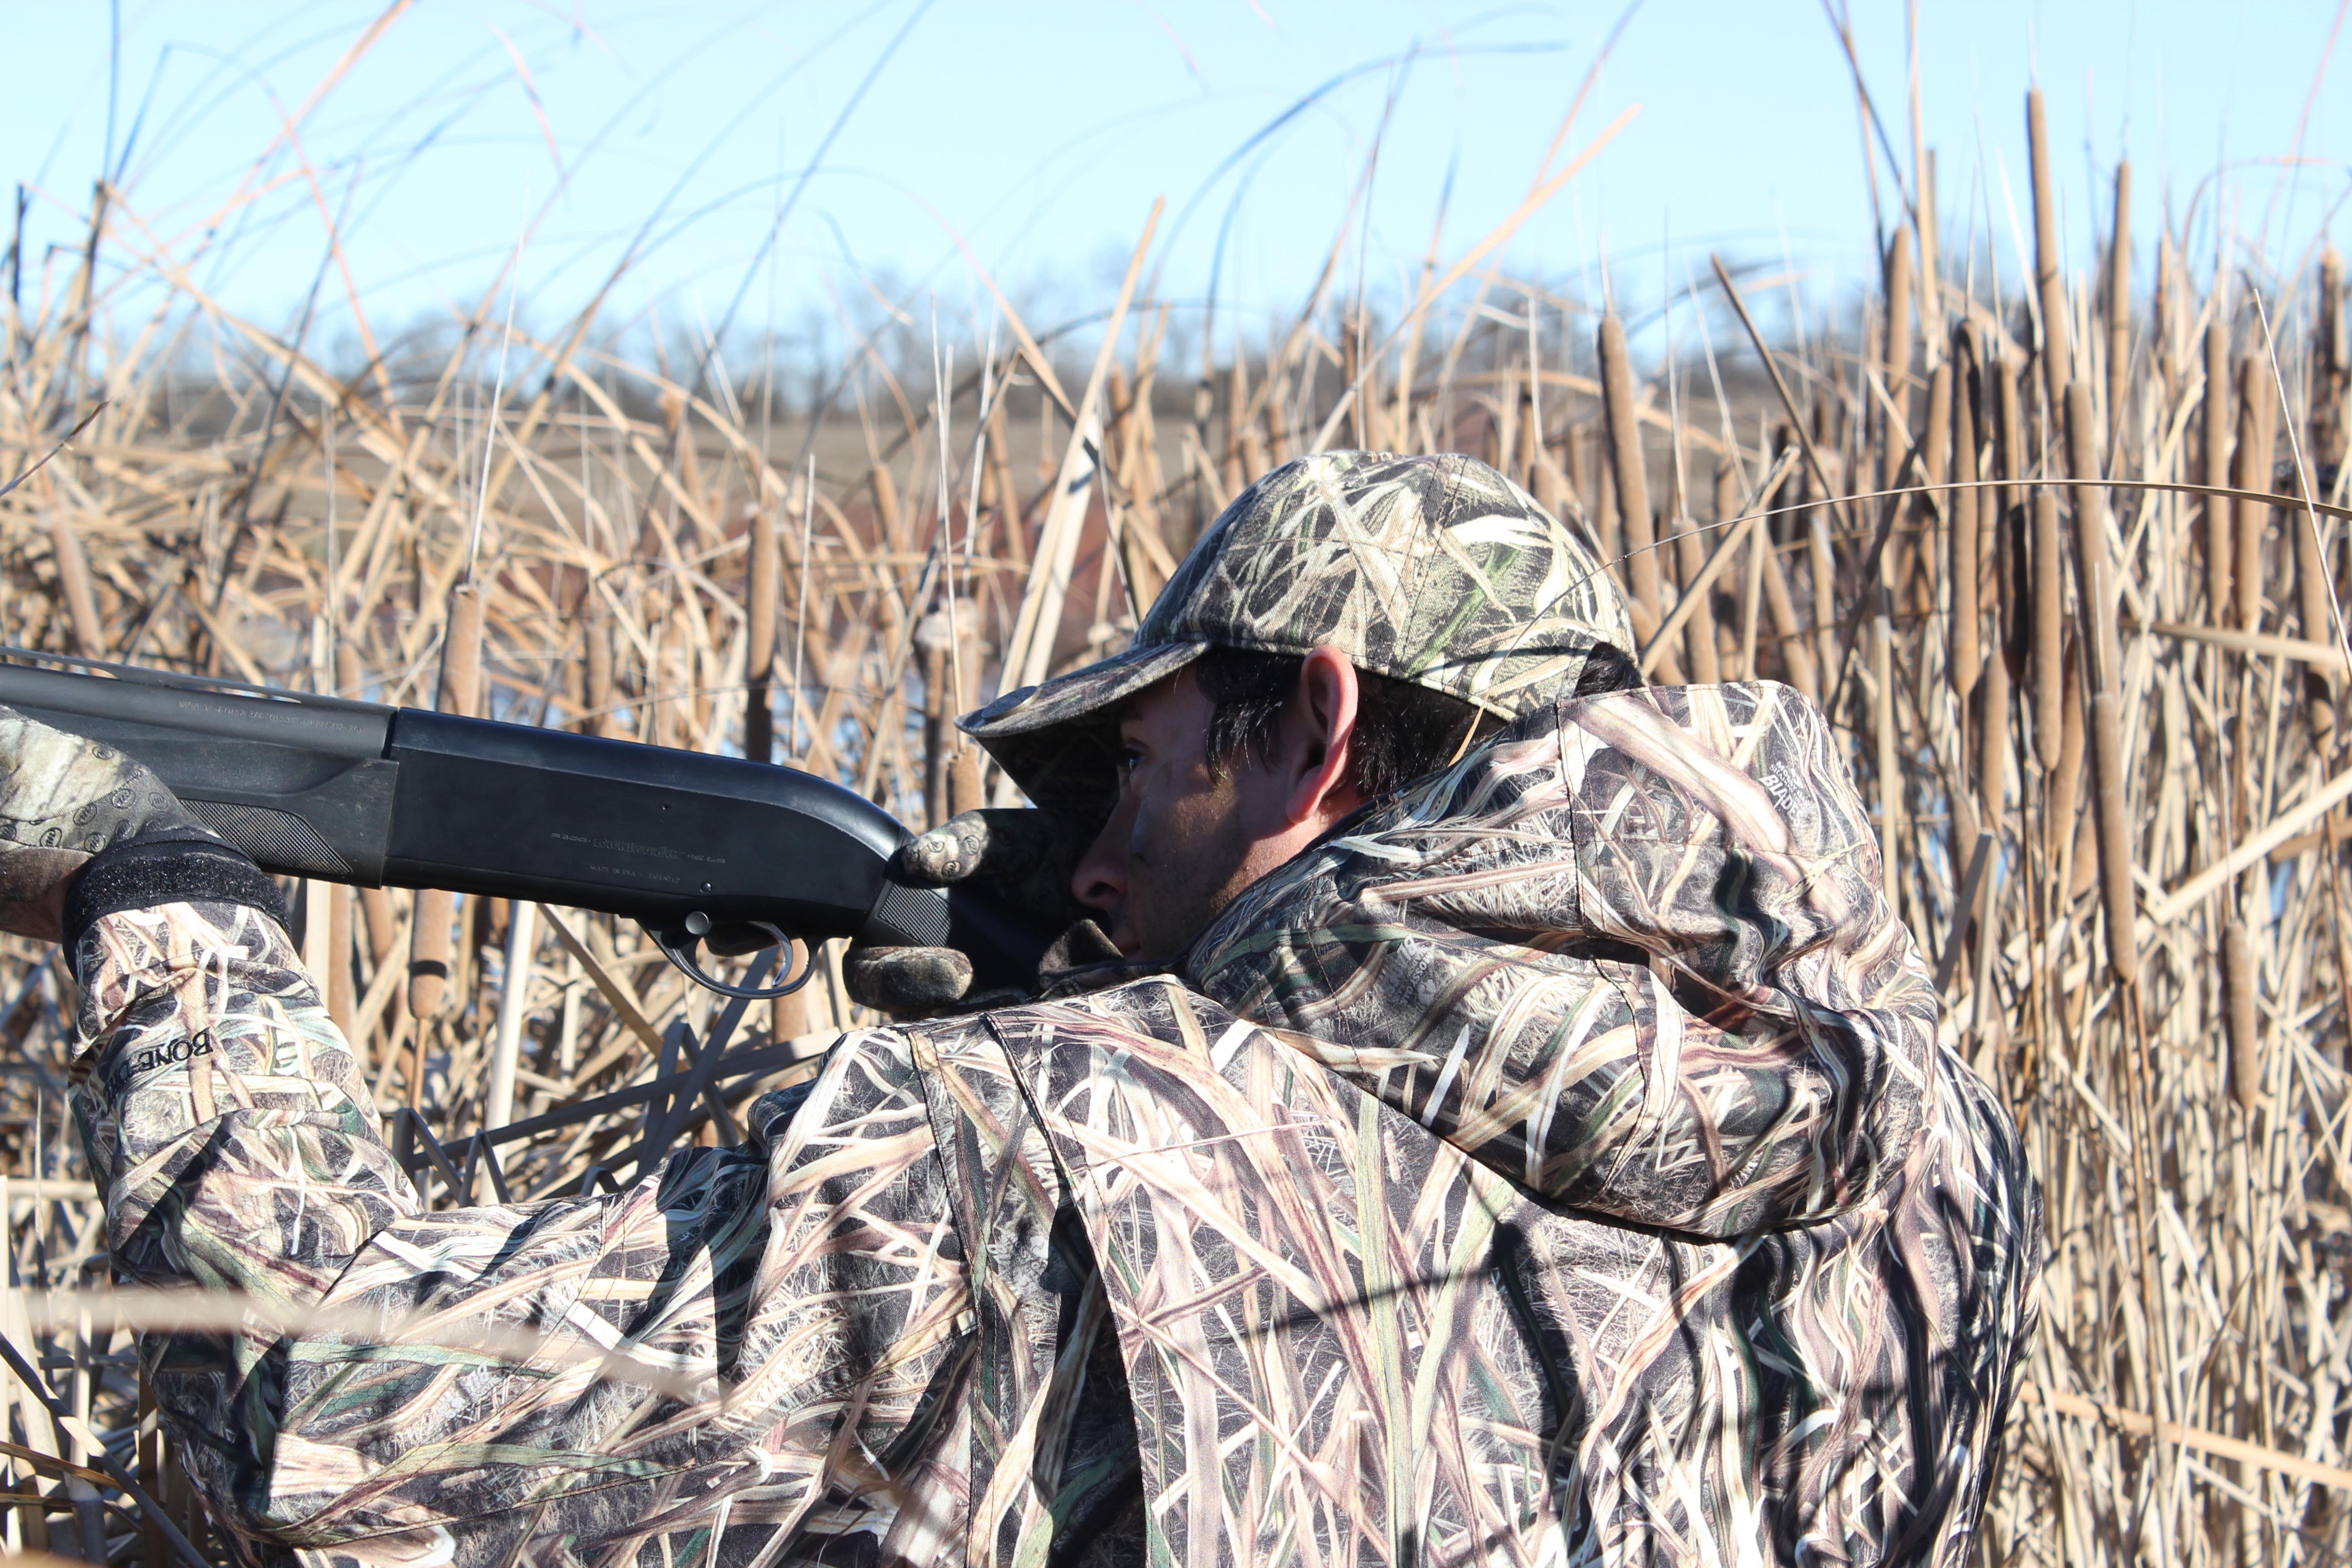 Man hunting ducks in a field